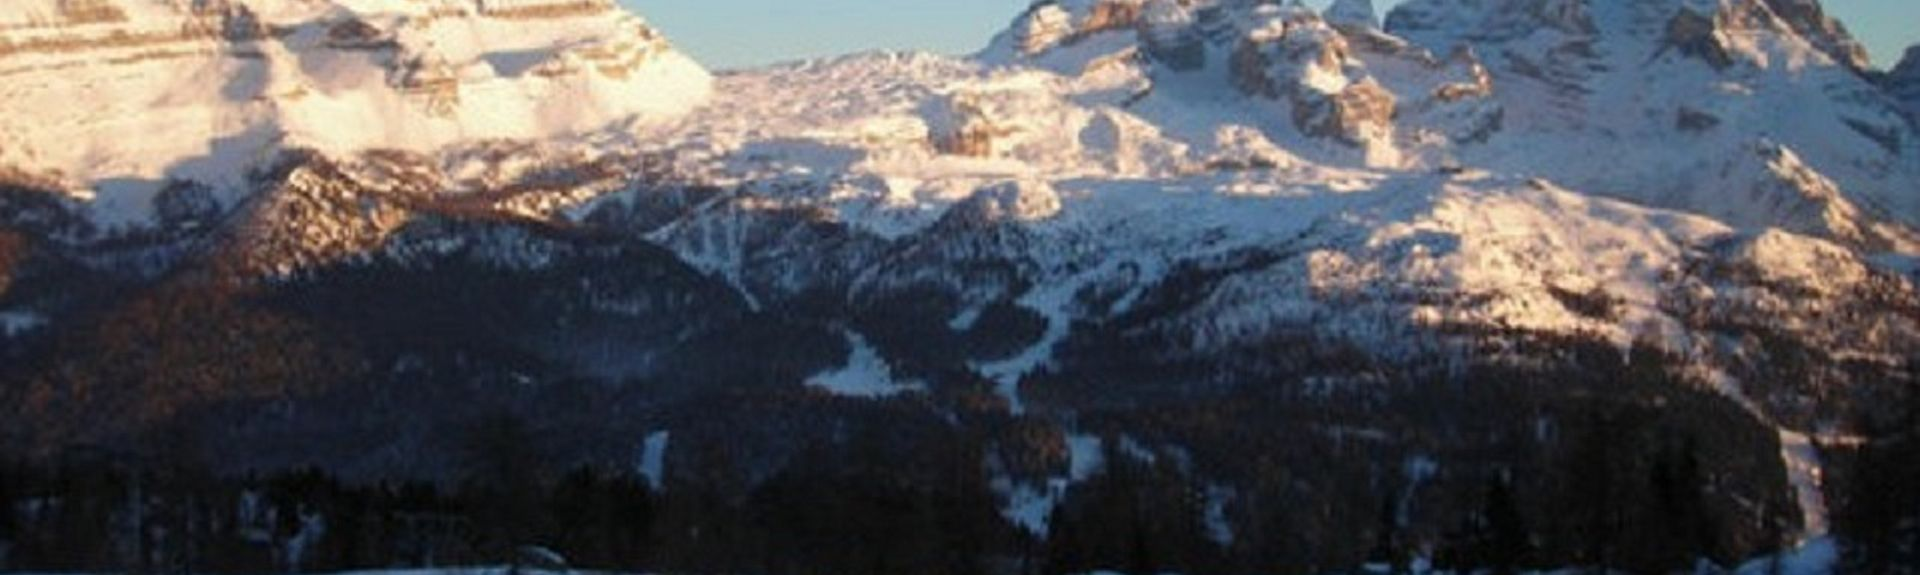 Cavedago, Trento, Trentino-Alto Adige/South Tyrol, Italy